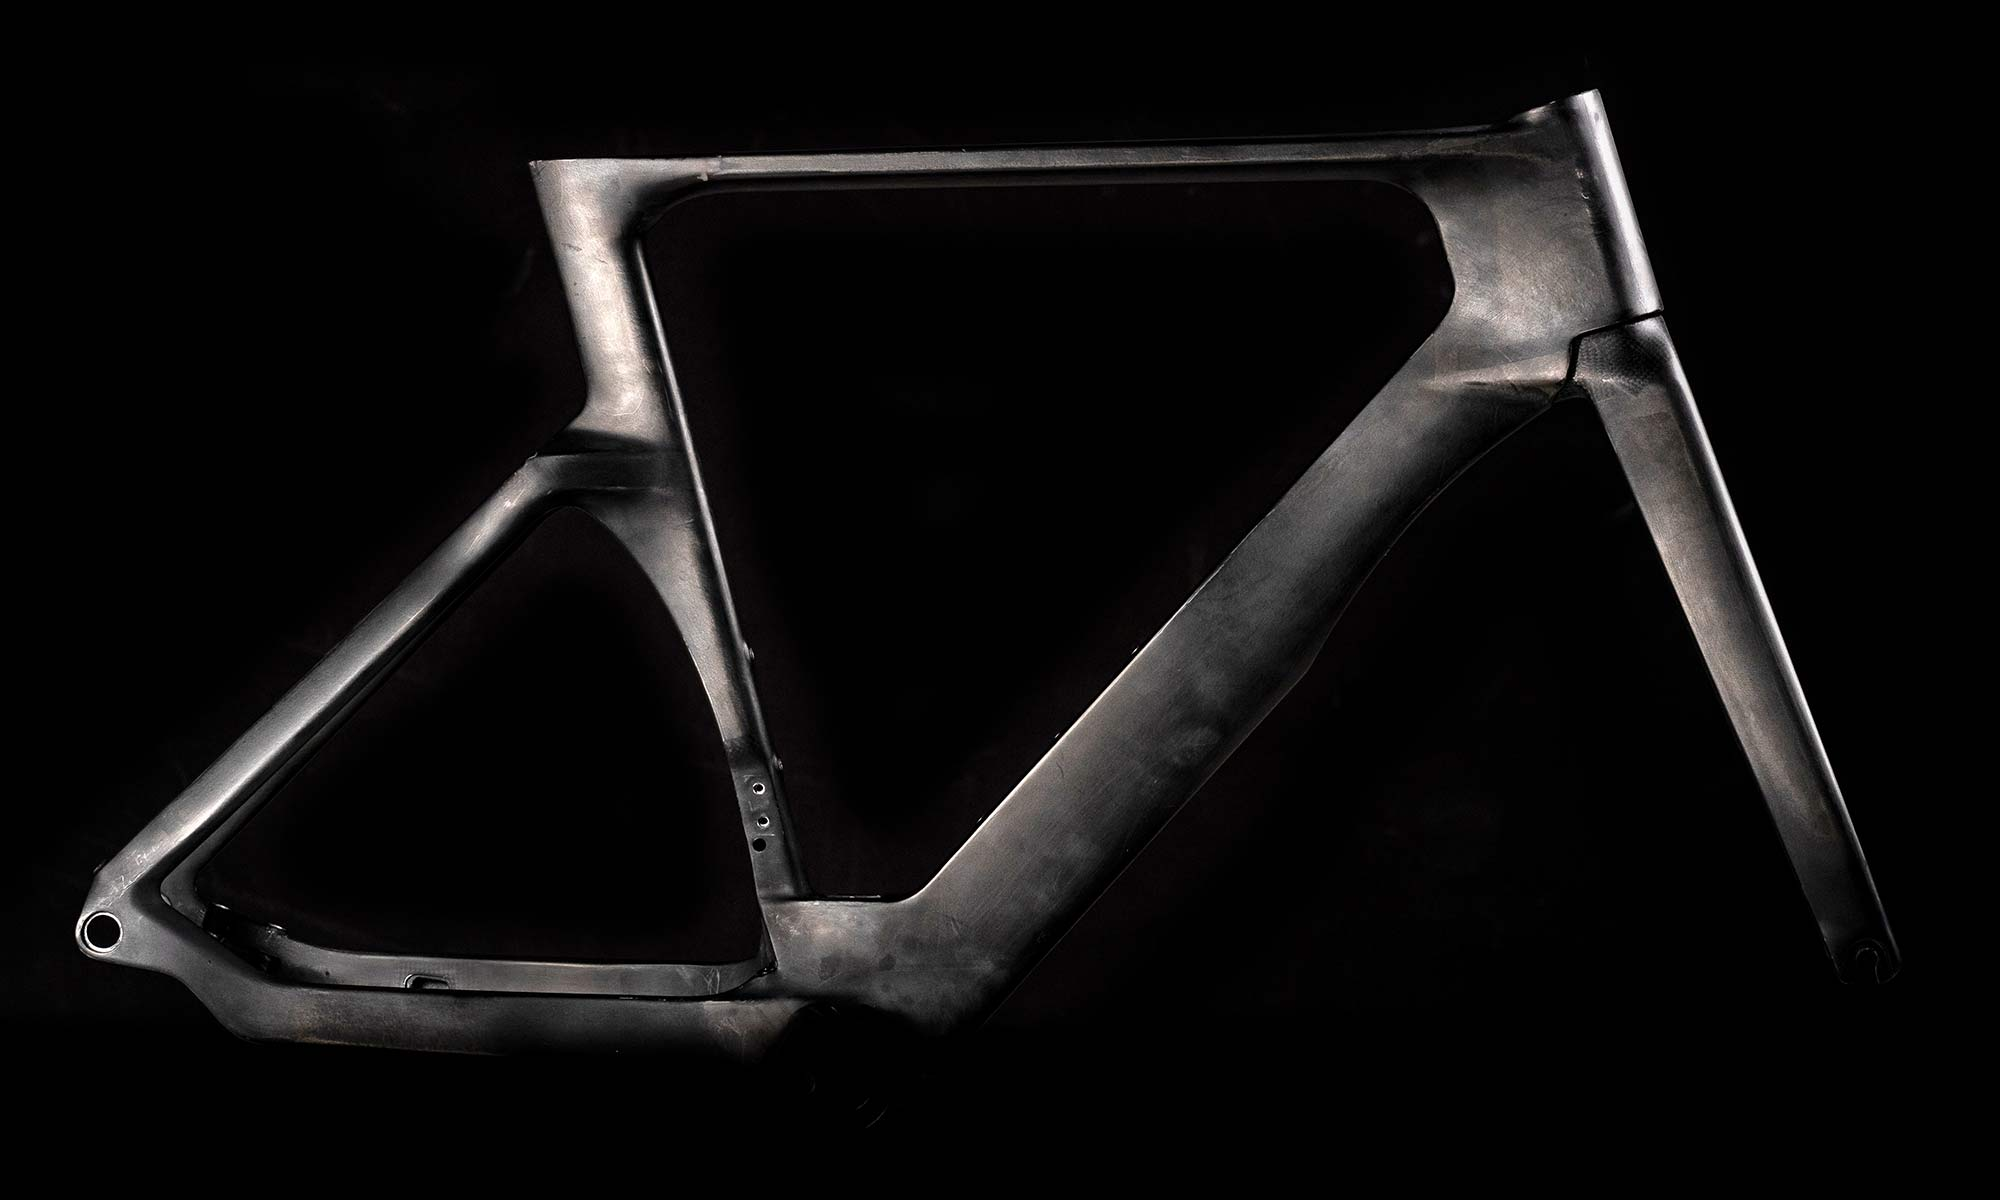 2022 Orbea Orca Aero carbon road bike, frameset